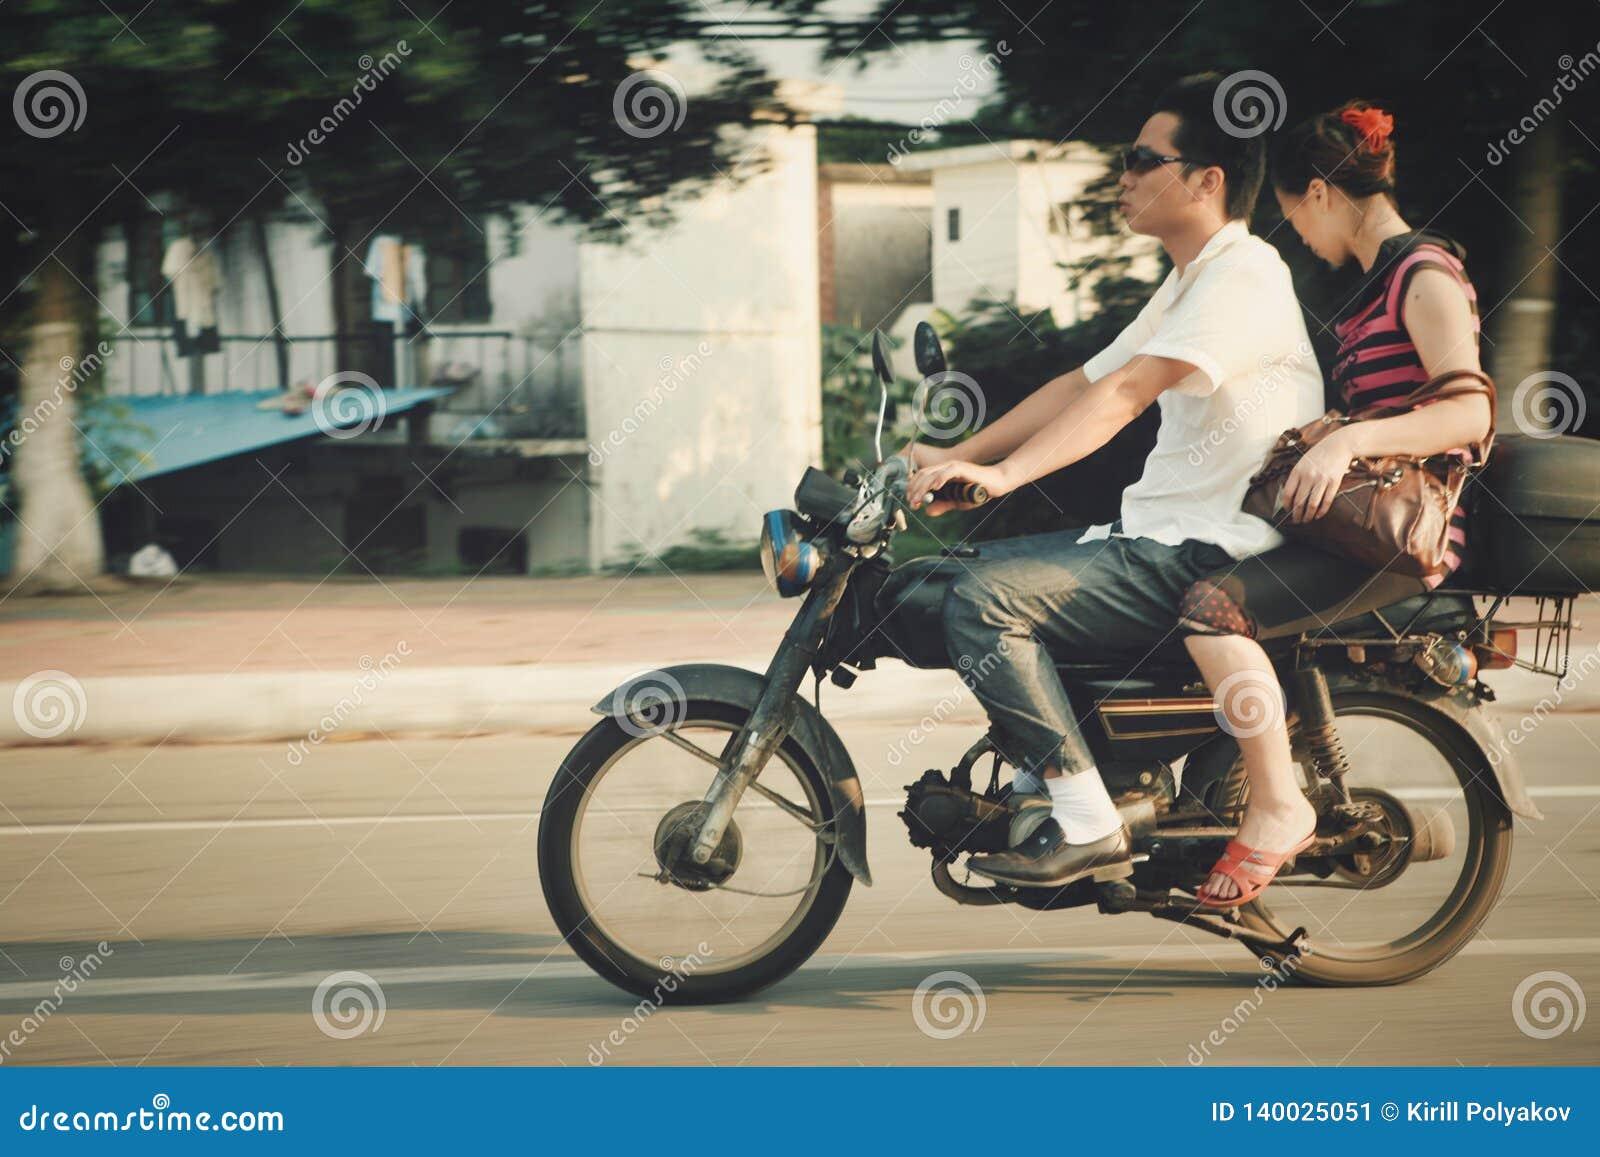 Guangzhou, China - July 22, 2018: Man and woman riding a motorcycle down the street in Guangzhou